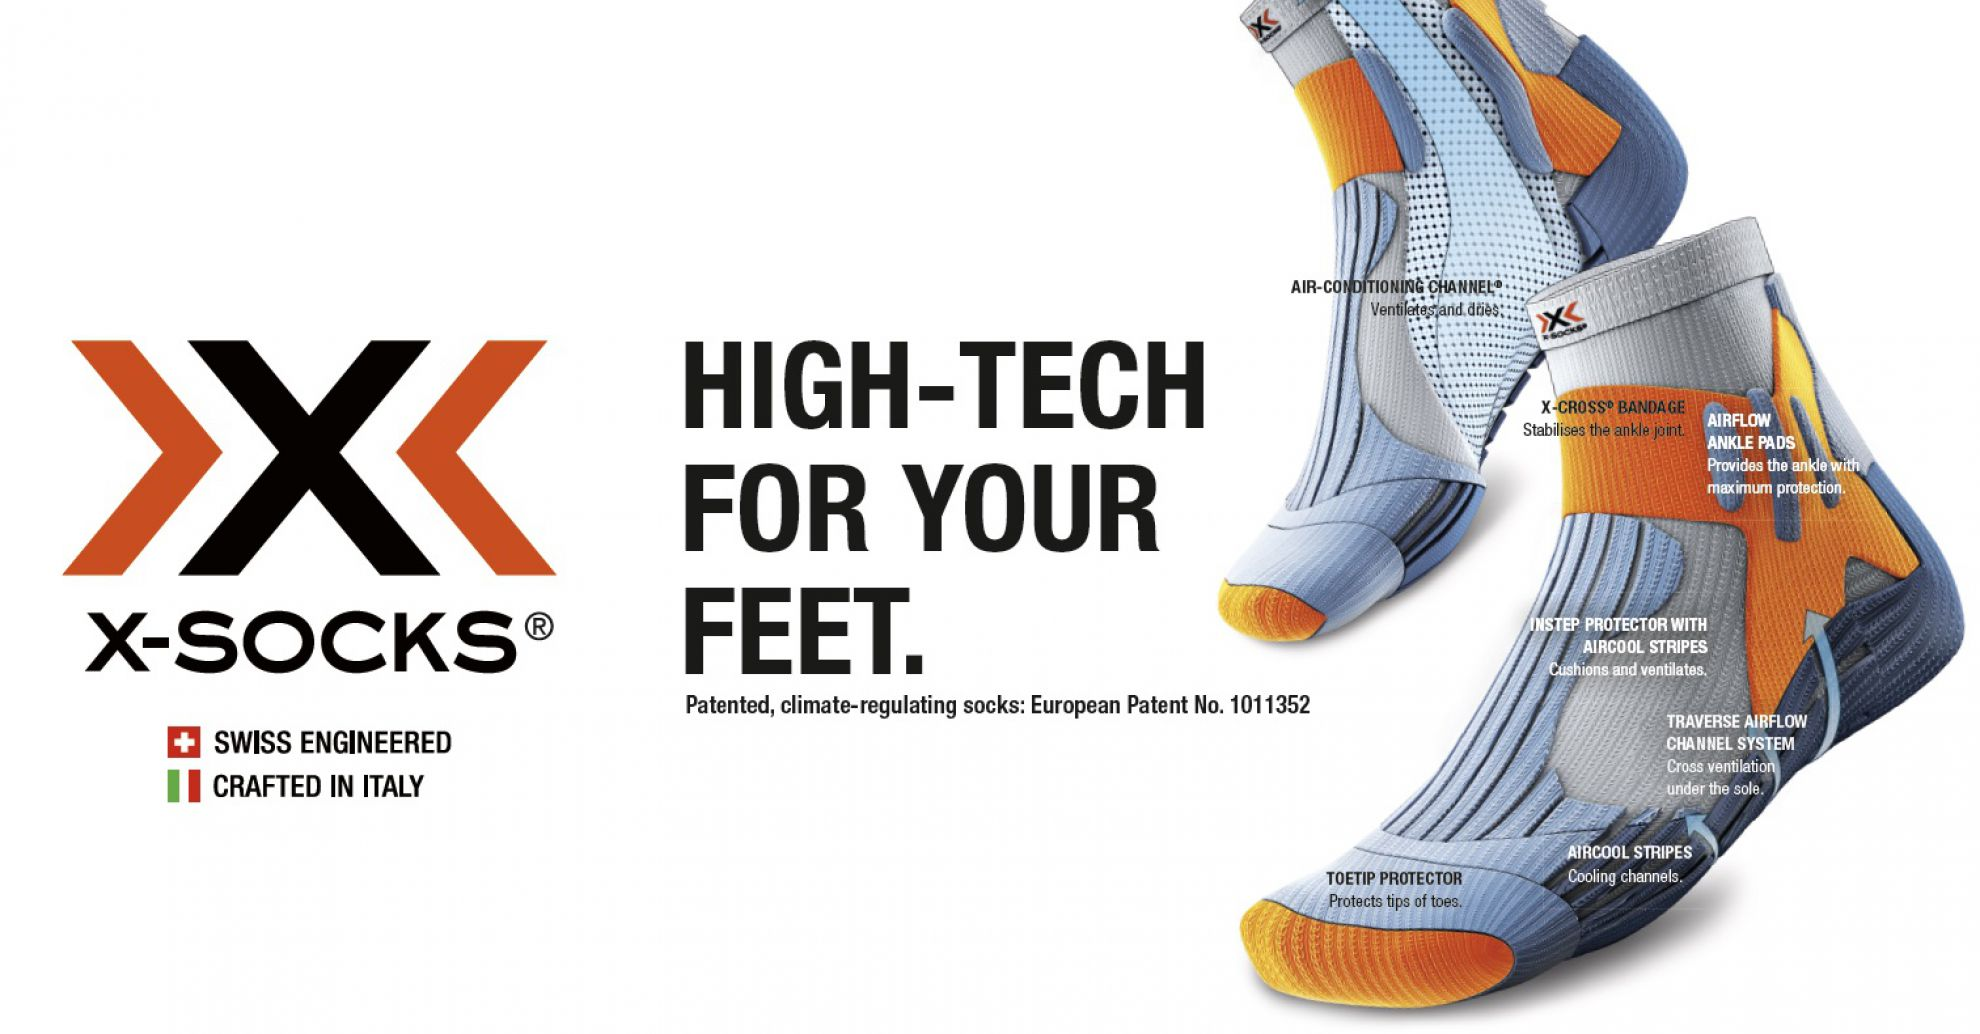 X-Socks, high tech for your feet